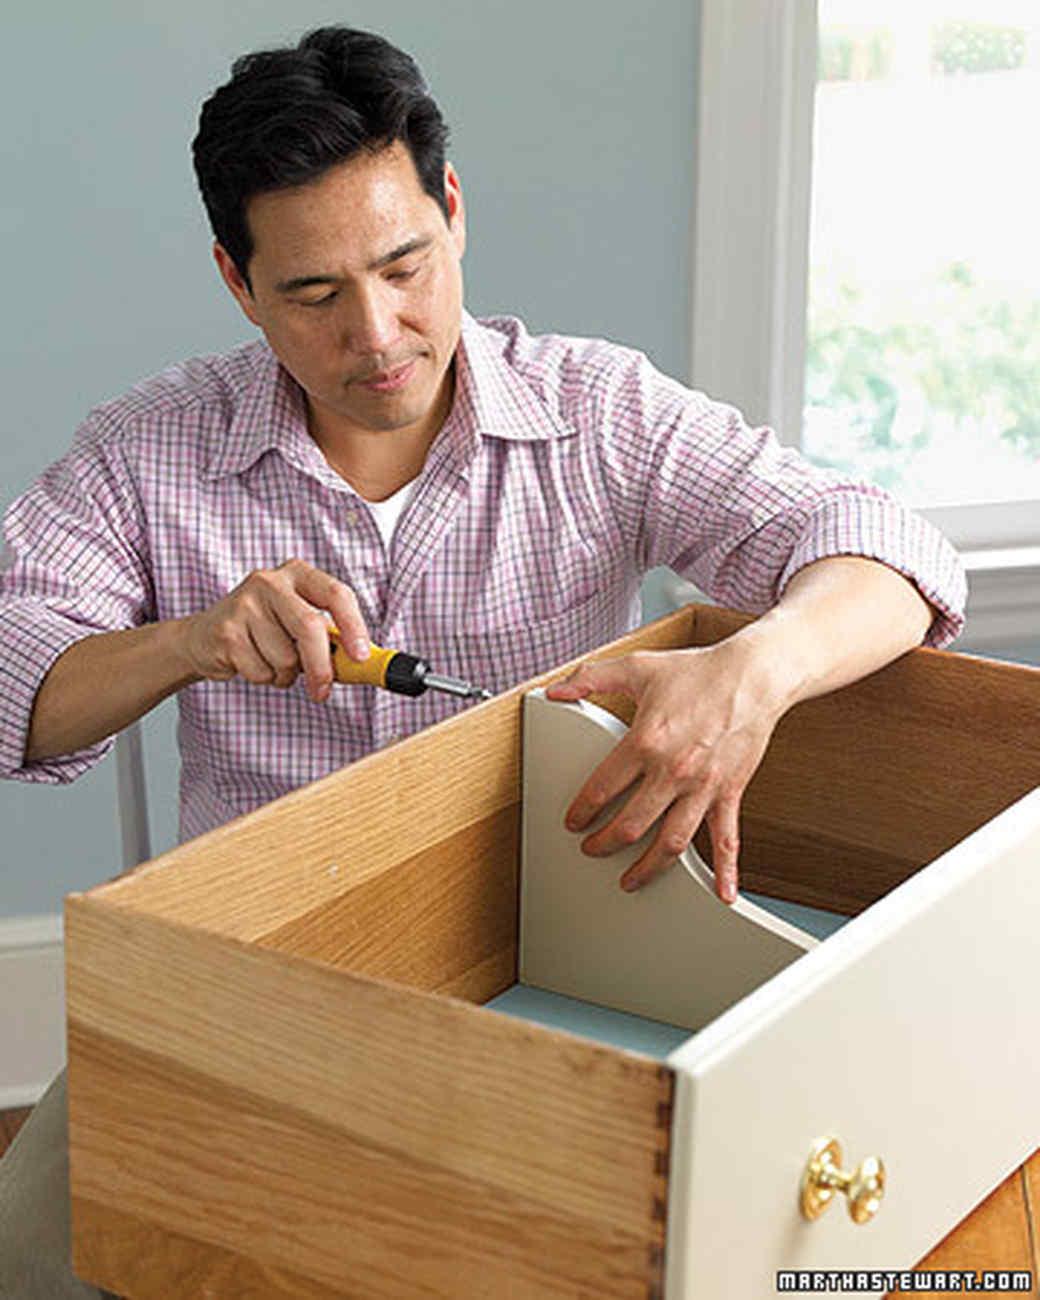 mld10301_0907_drawershelfht.jpg